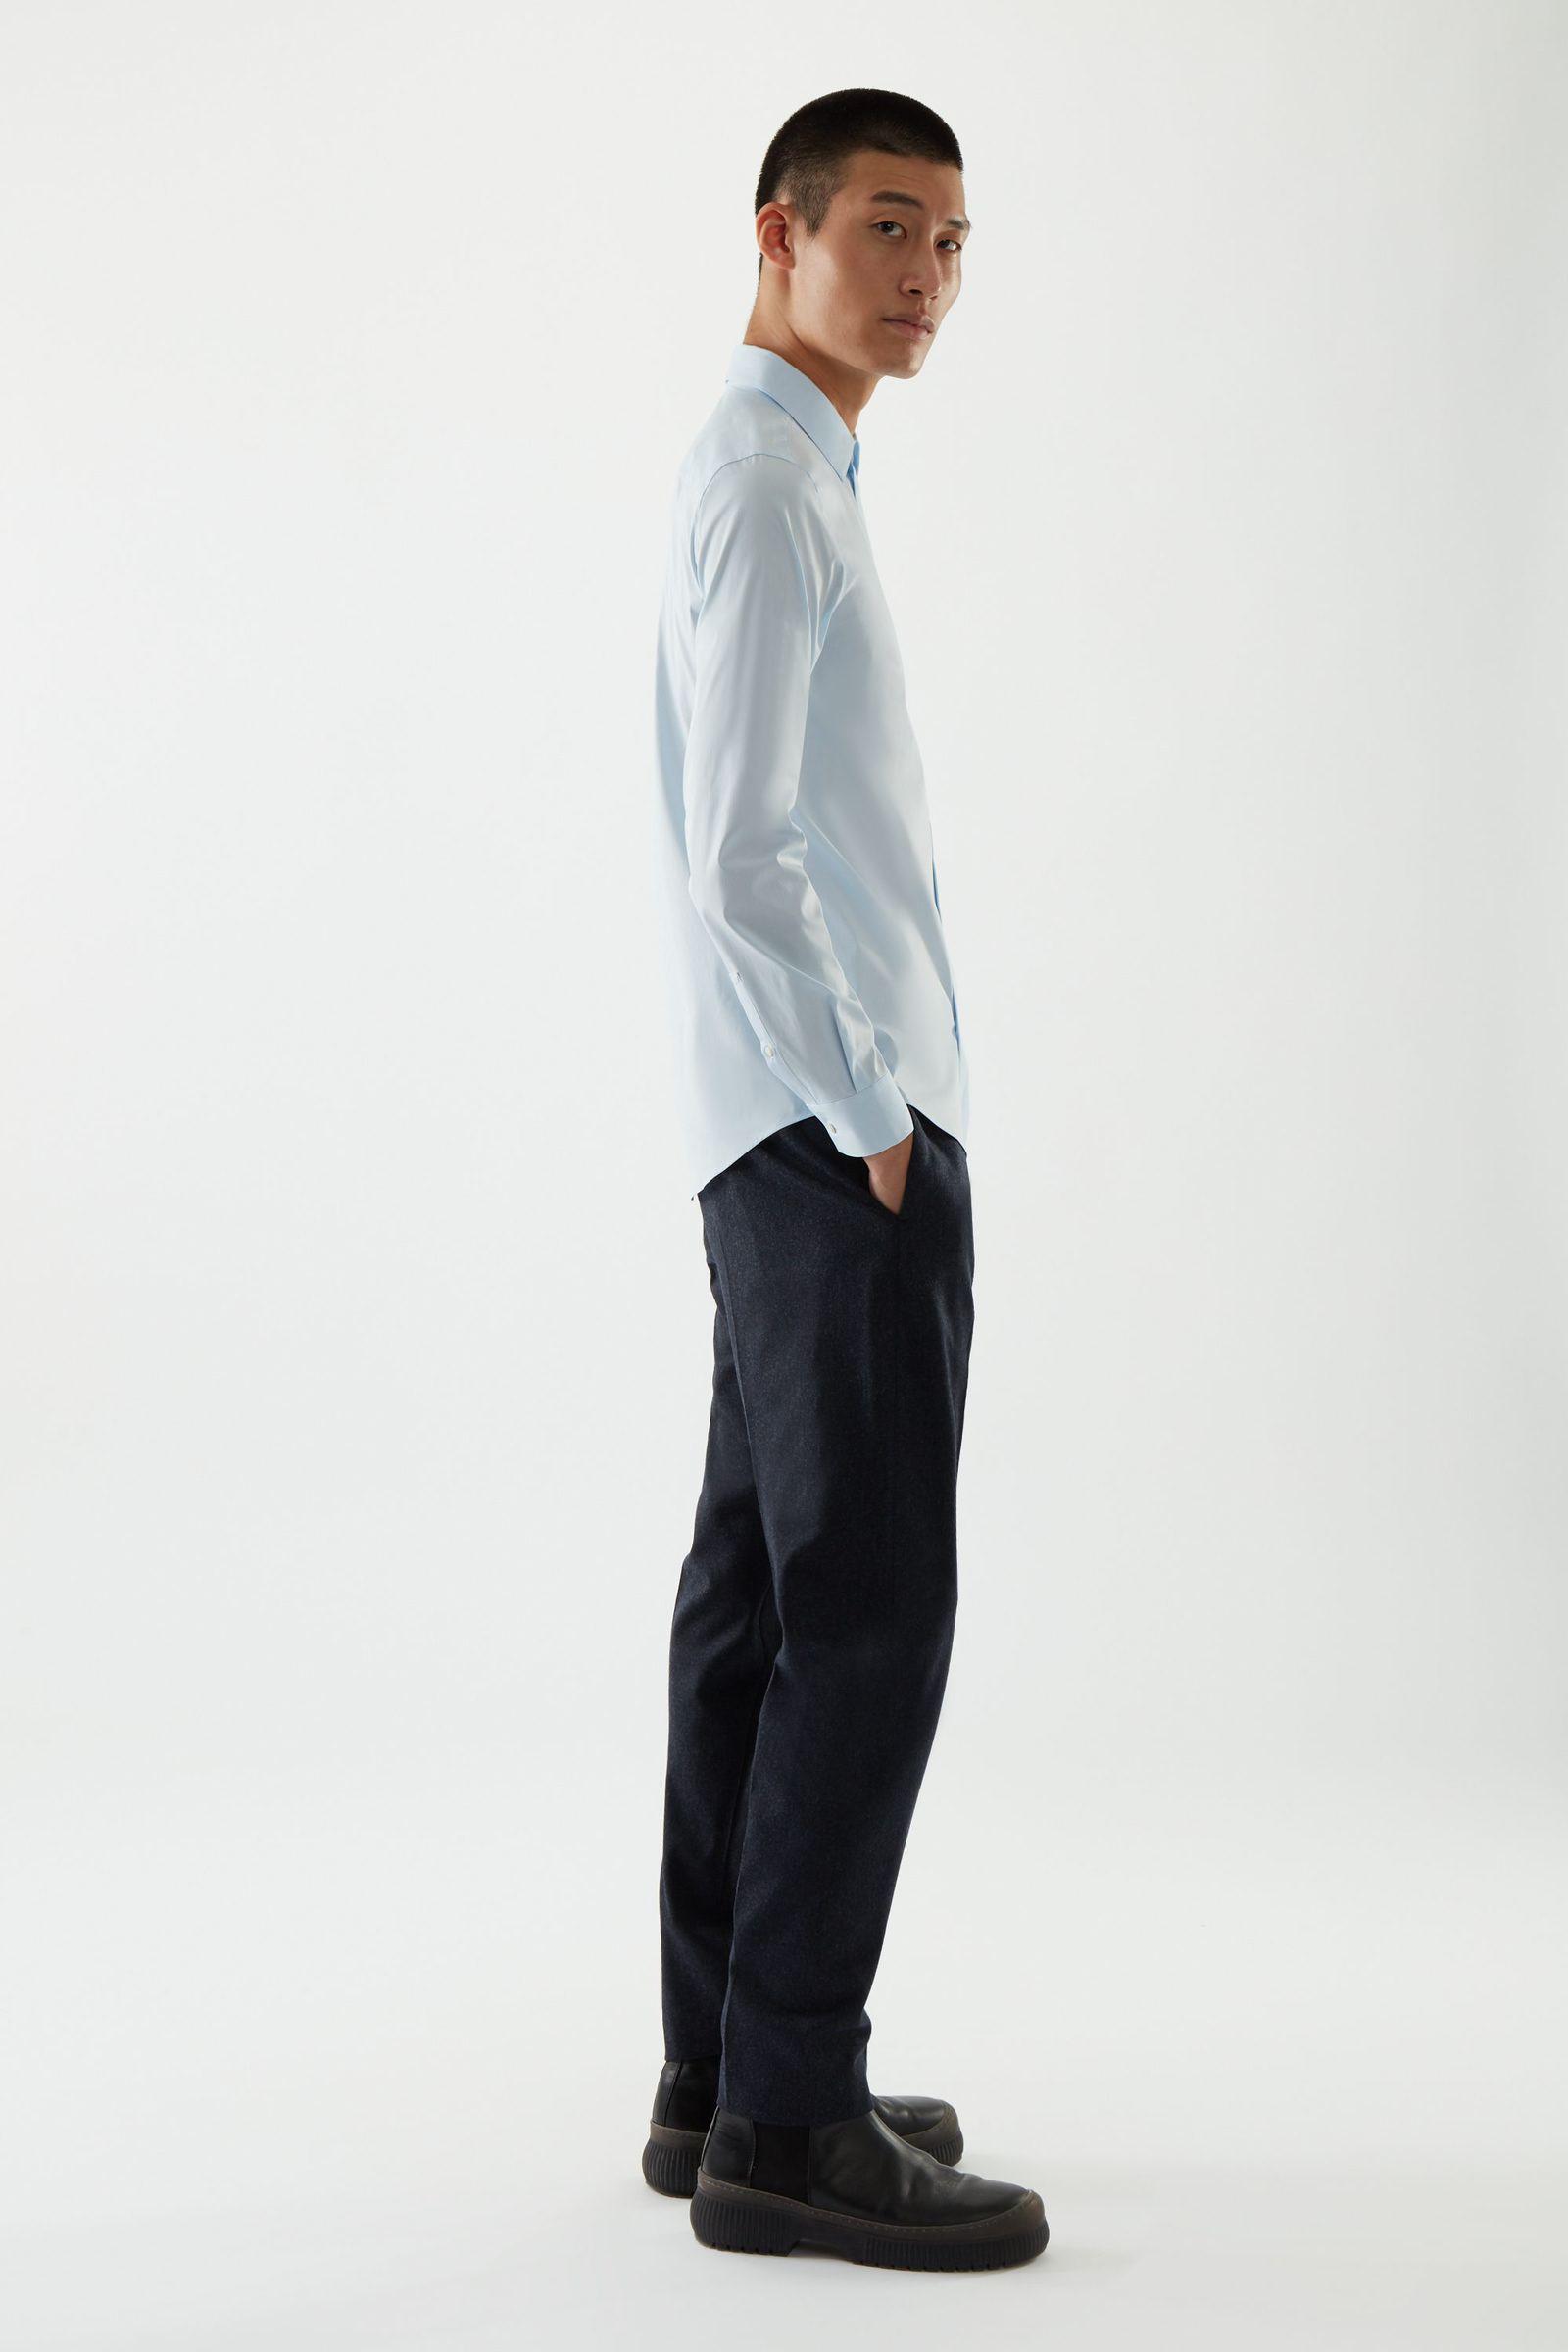 COS 오가닉 코튼 클래식 슬림 핏 셔츠의 스카이 블루컬러 ECOMLook입니다.